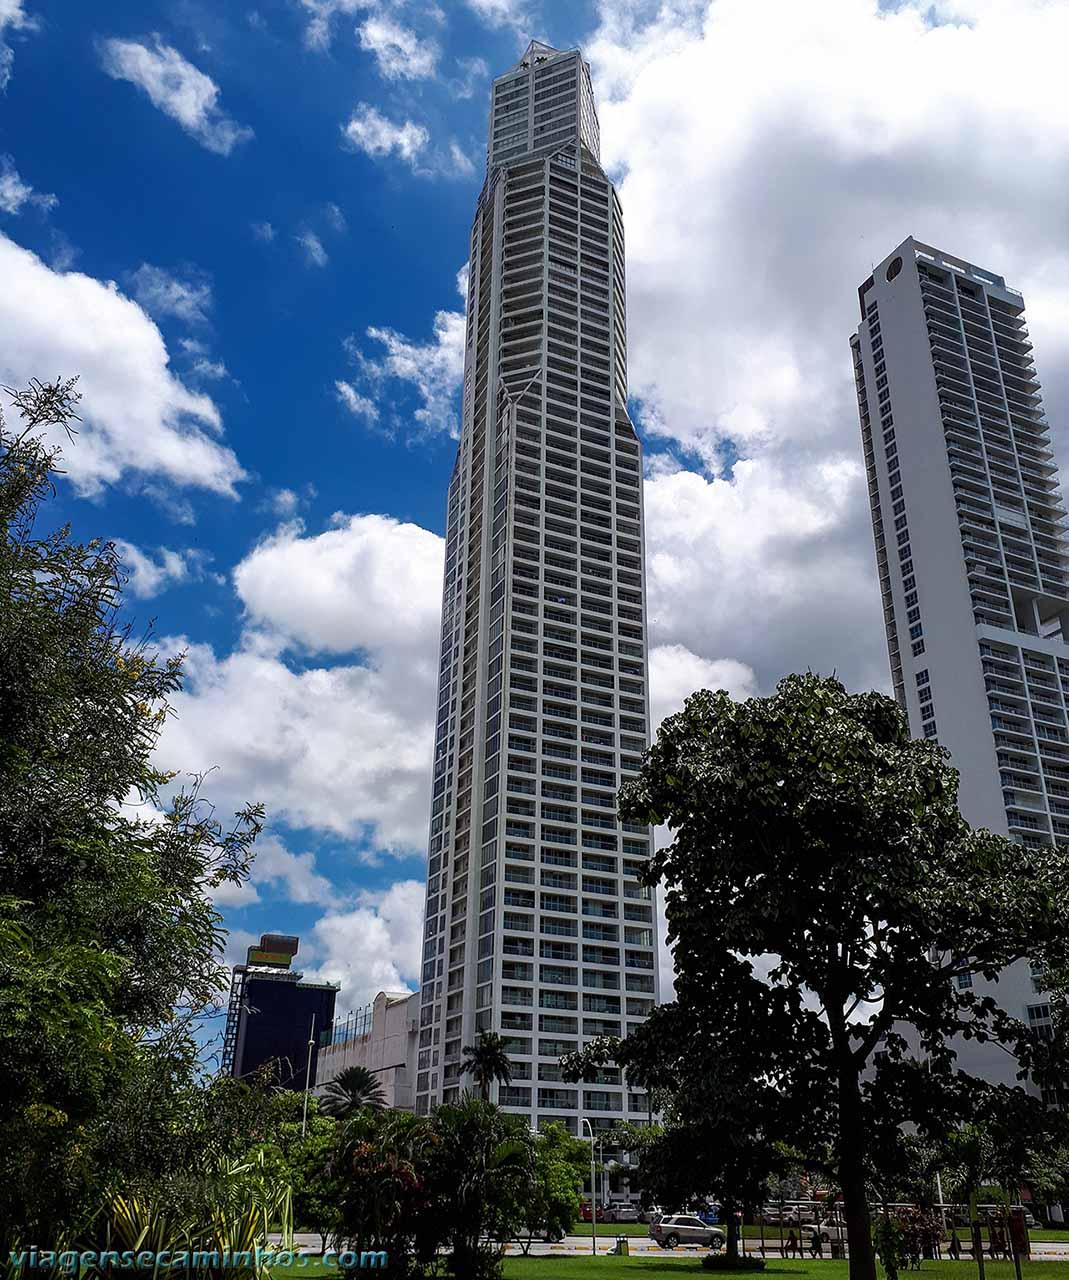 Rivage tower - Panamá